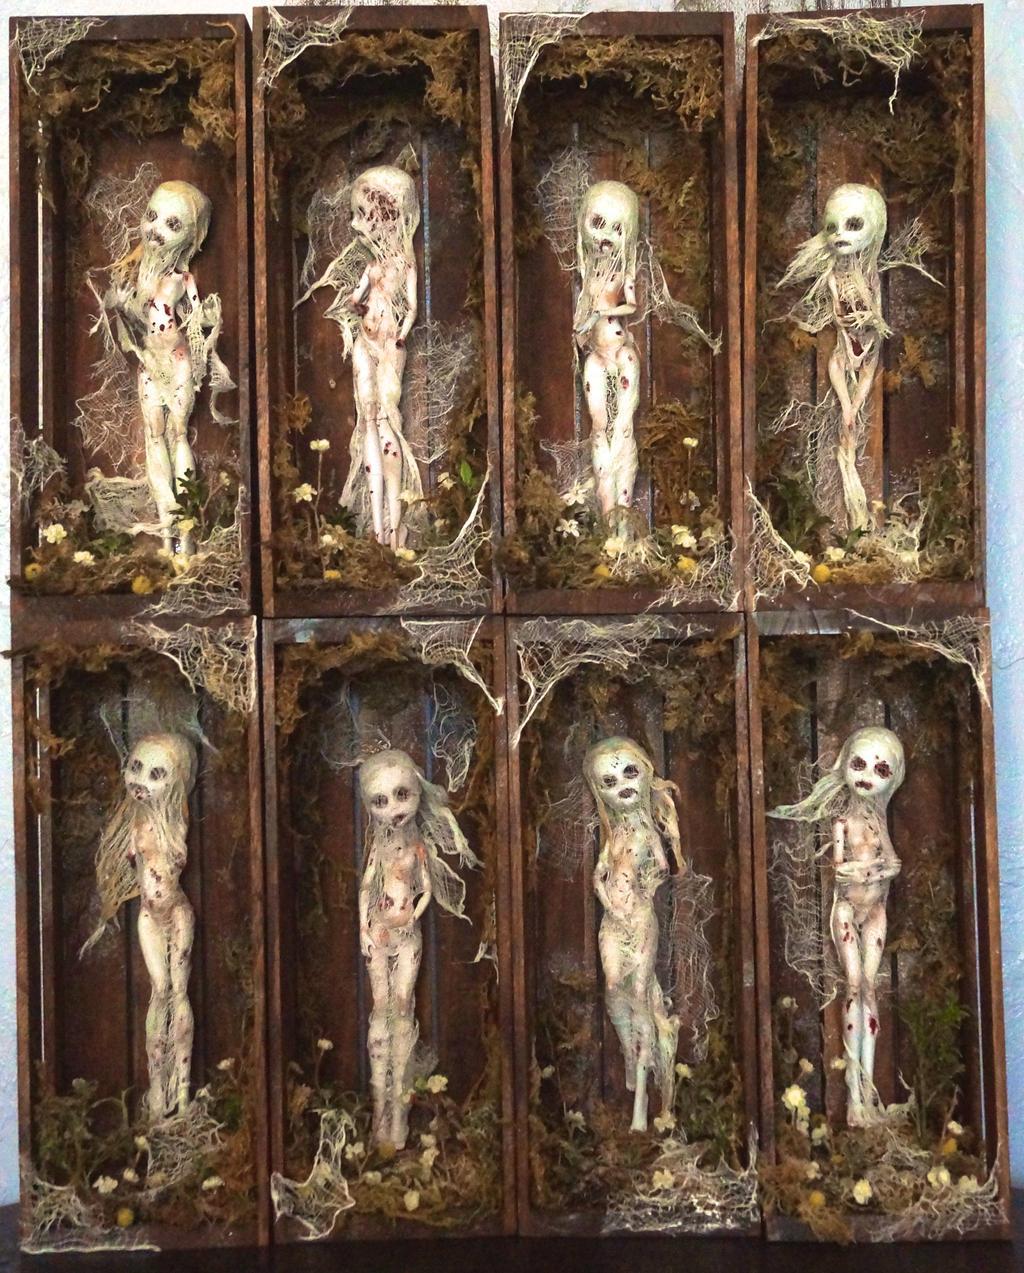 Monster High Modded Dolls (Zombie girls) by sankyaku